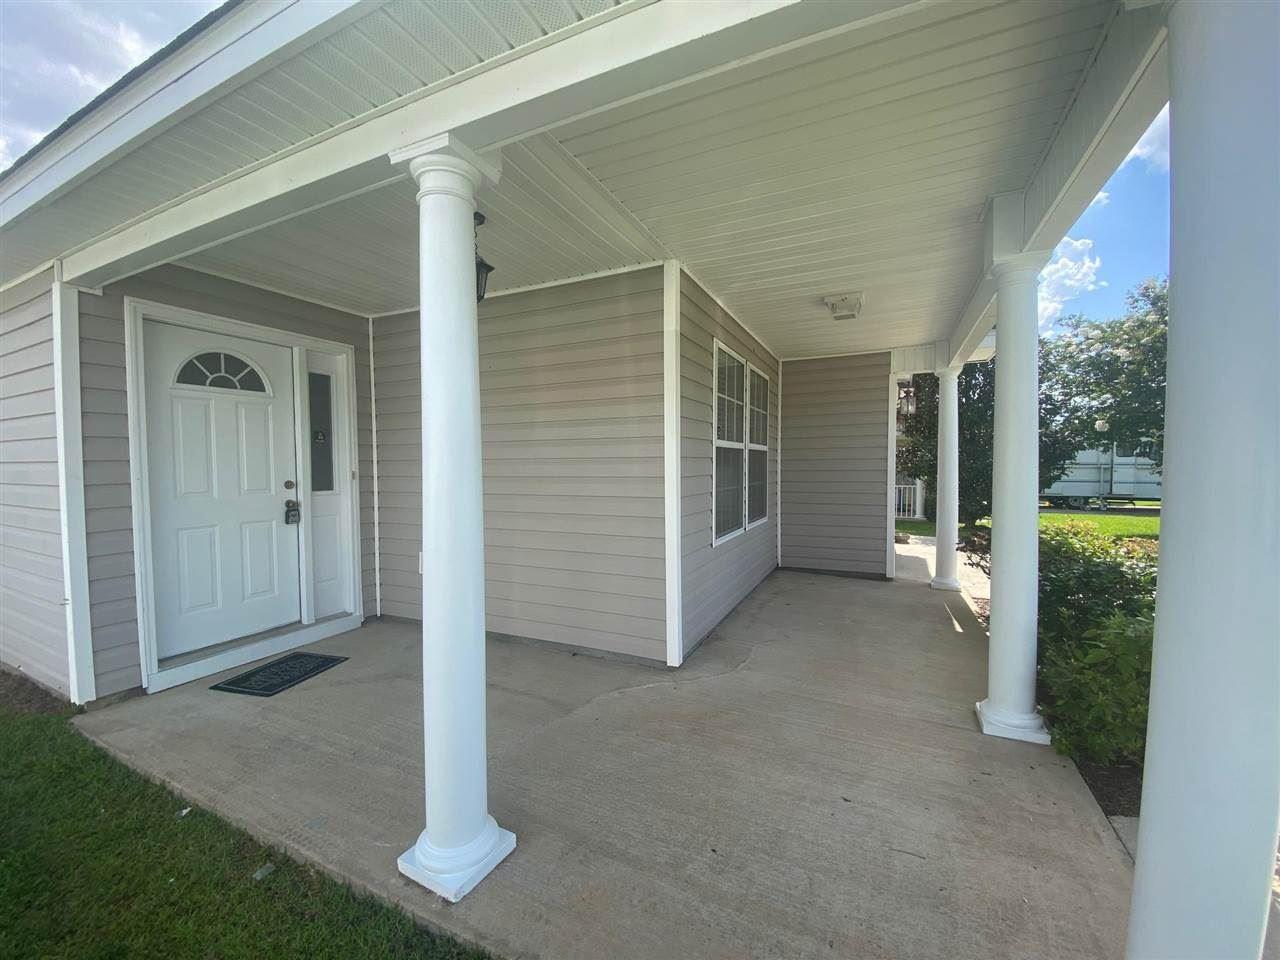 Photo of 3292 Woodbriar Lane, TALLAHASSEE, FL 32303 (MLS # 335271)